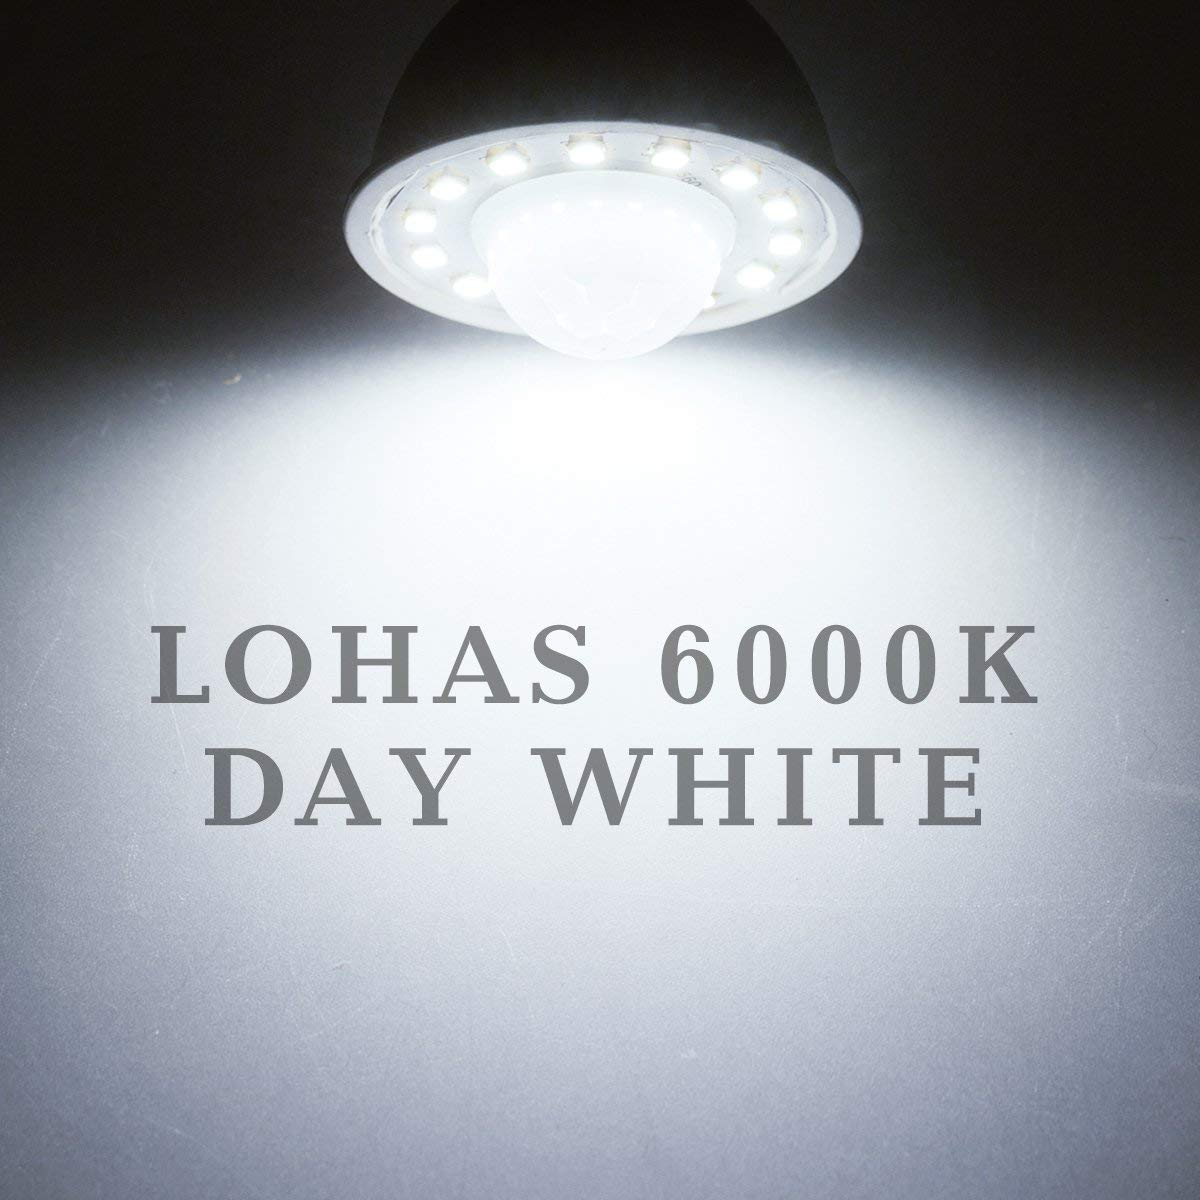 Image 5 - GU10 PIR Motion Sensor LED Light Bulbs 5W,50W Equivalent 500lm Day White 6000K for Stairs Garage Corridor Walkway Hallway 2Pack-in LED Bulbs & Tubes from Lights & Lighting